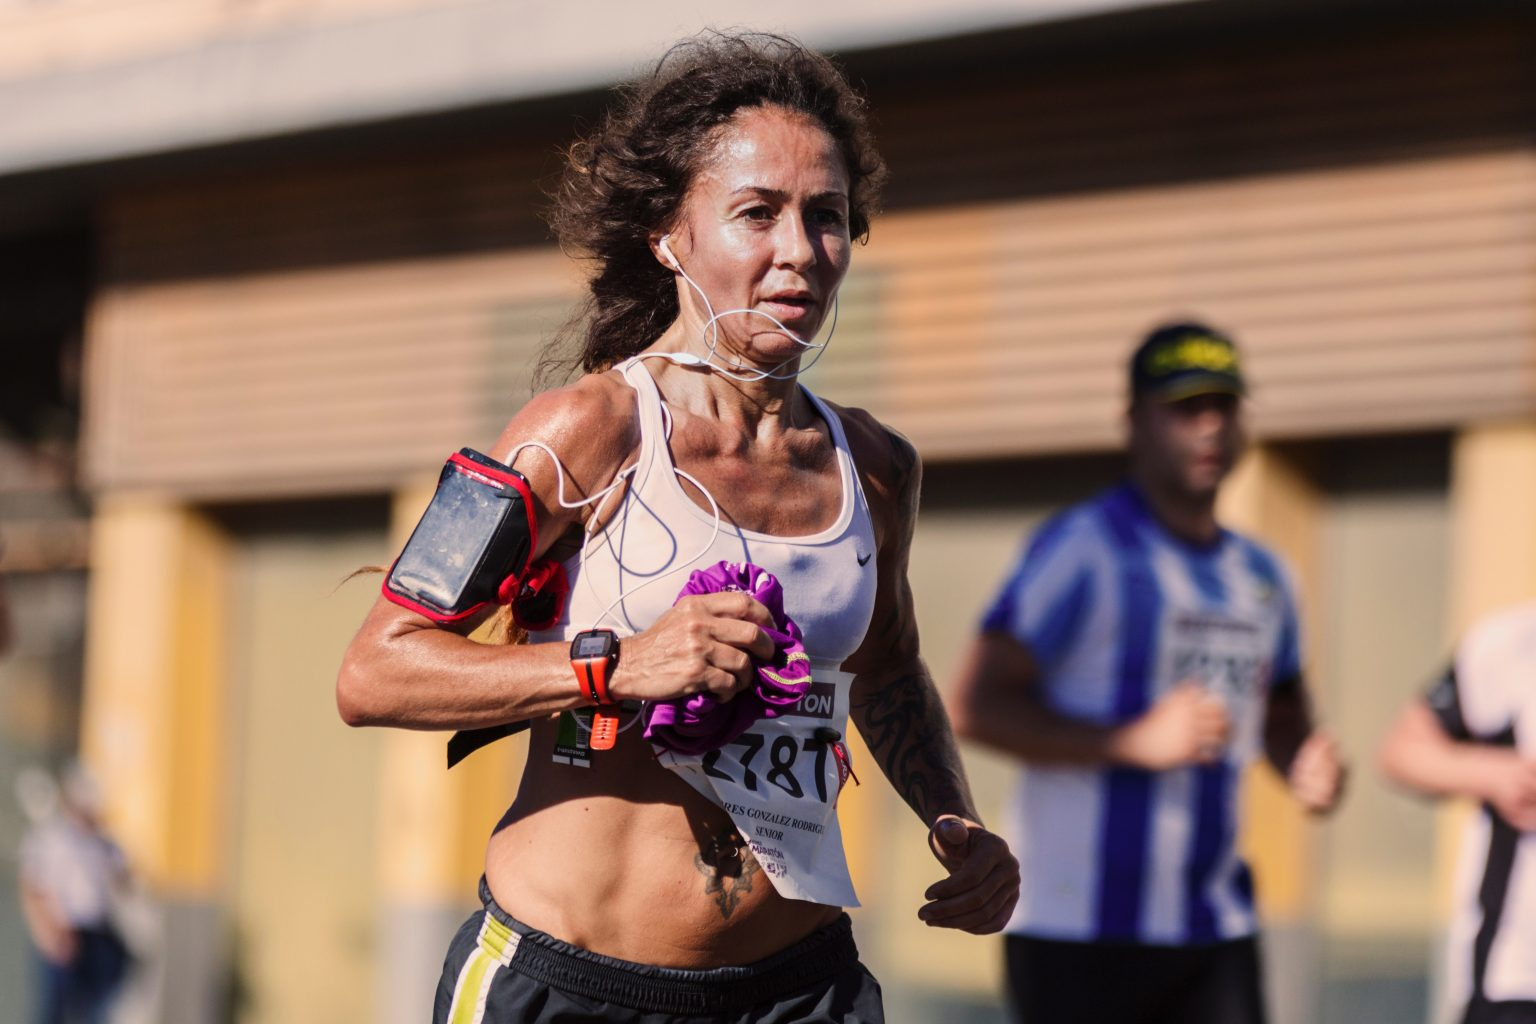 woman marathon